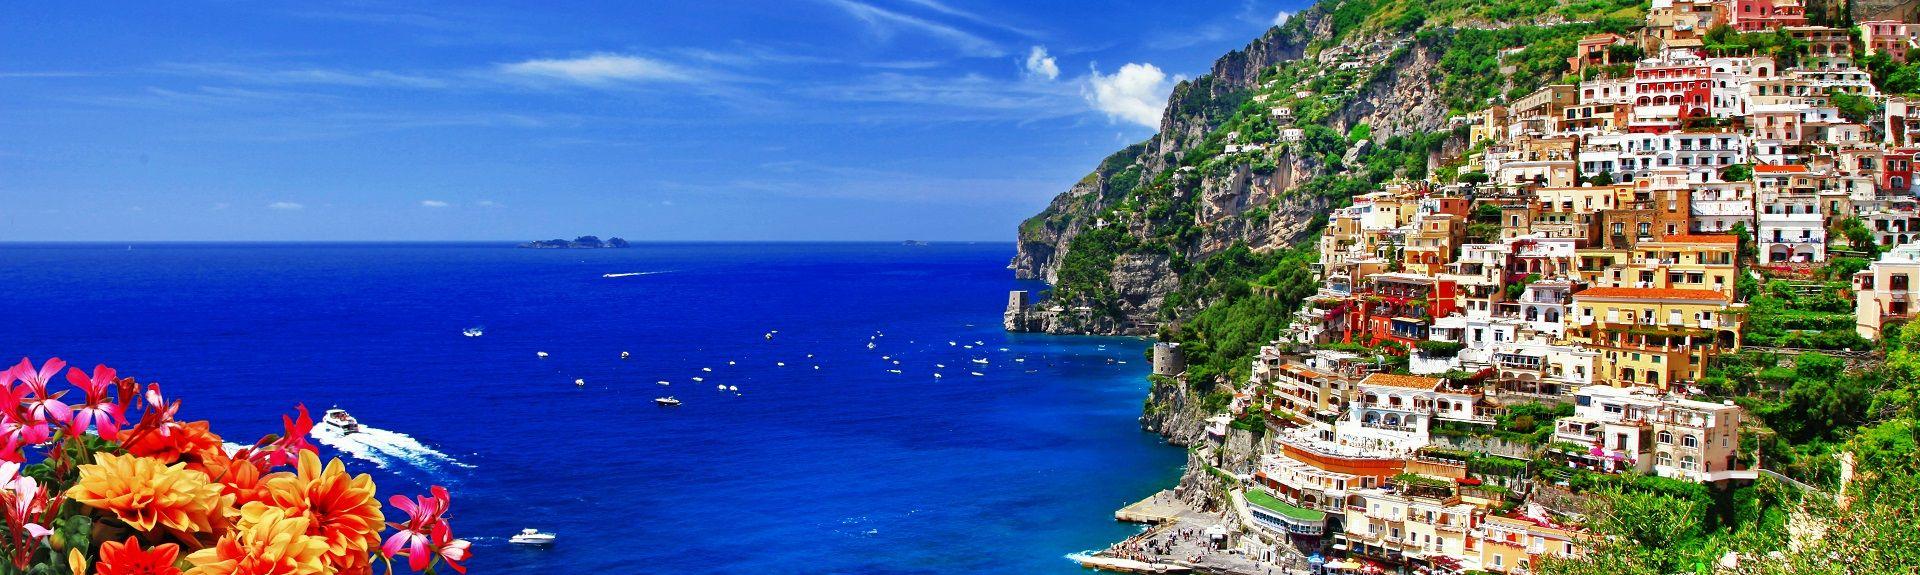 Campania, Italië